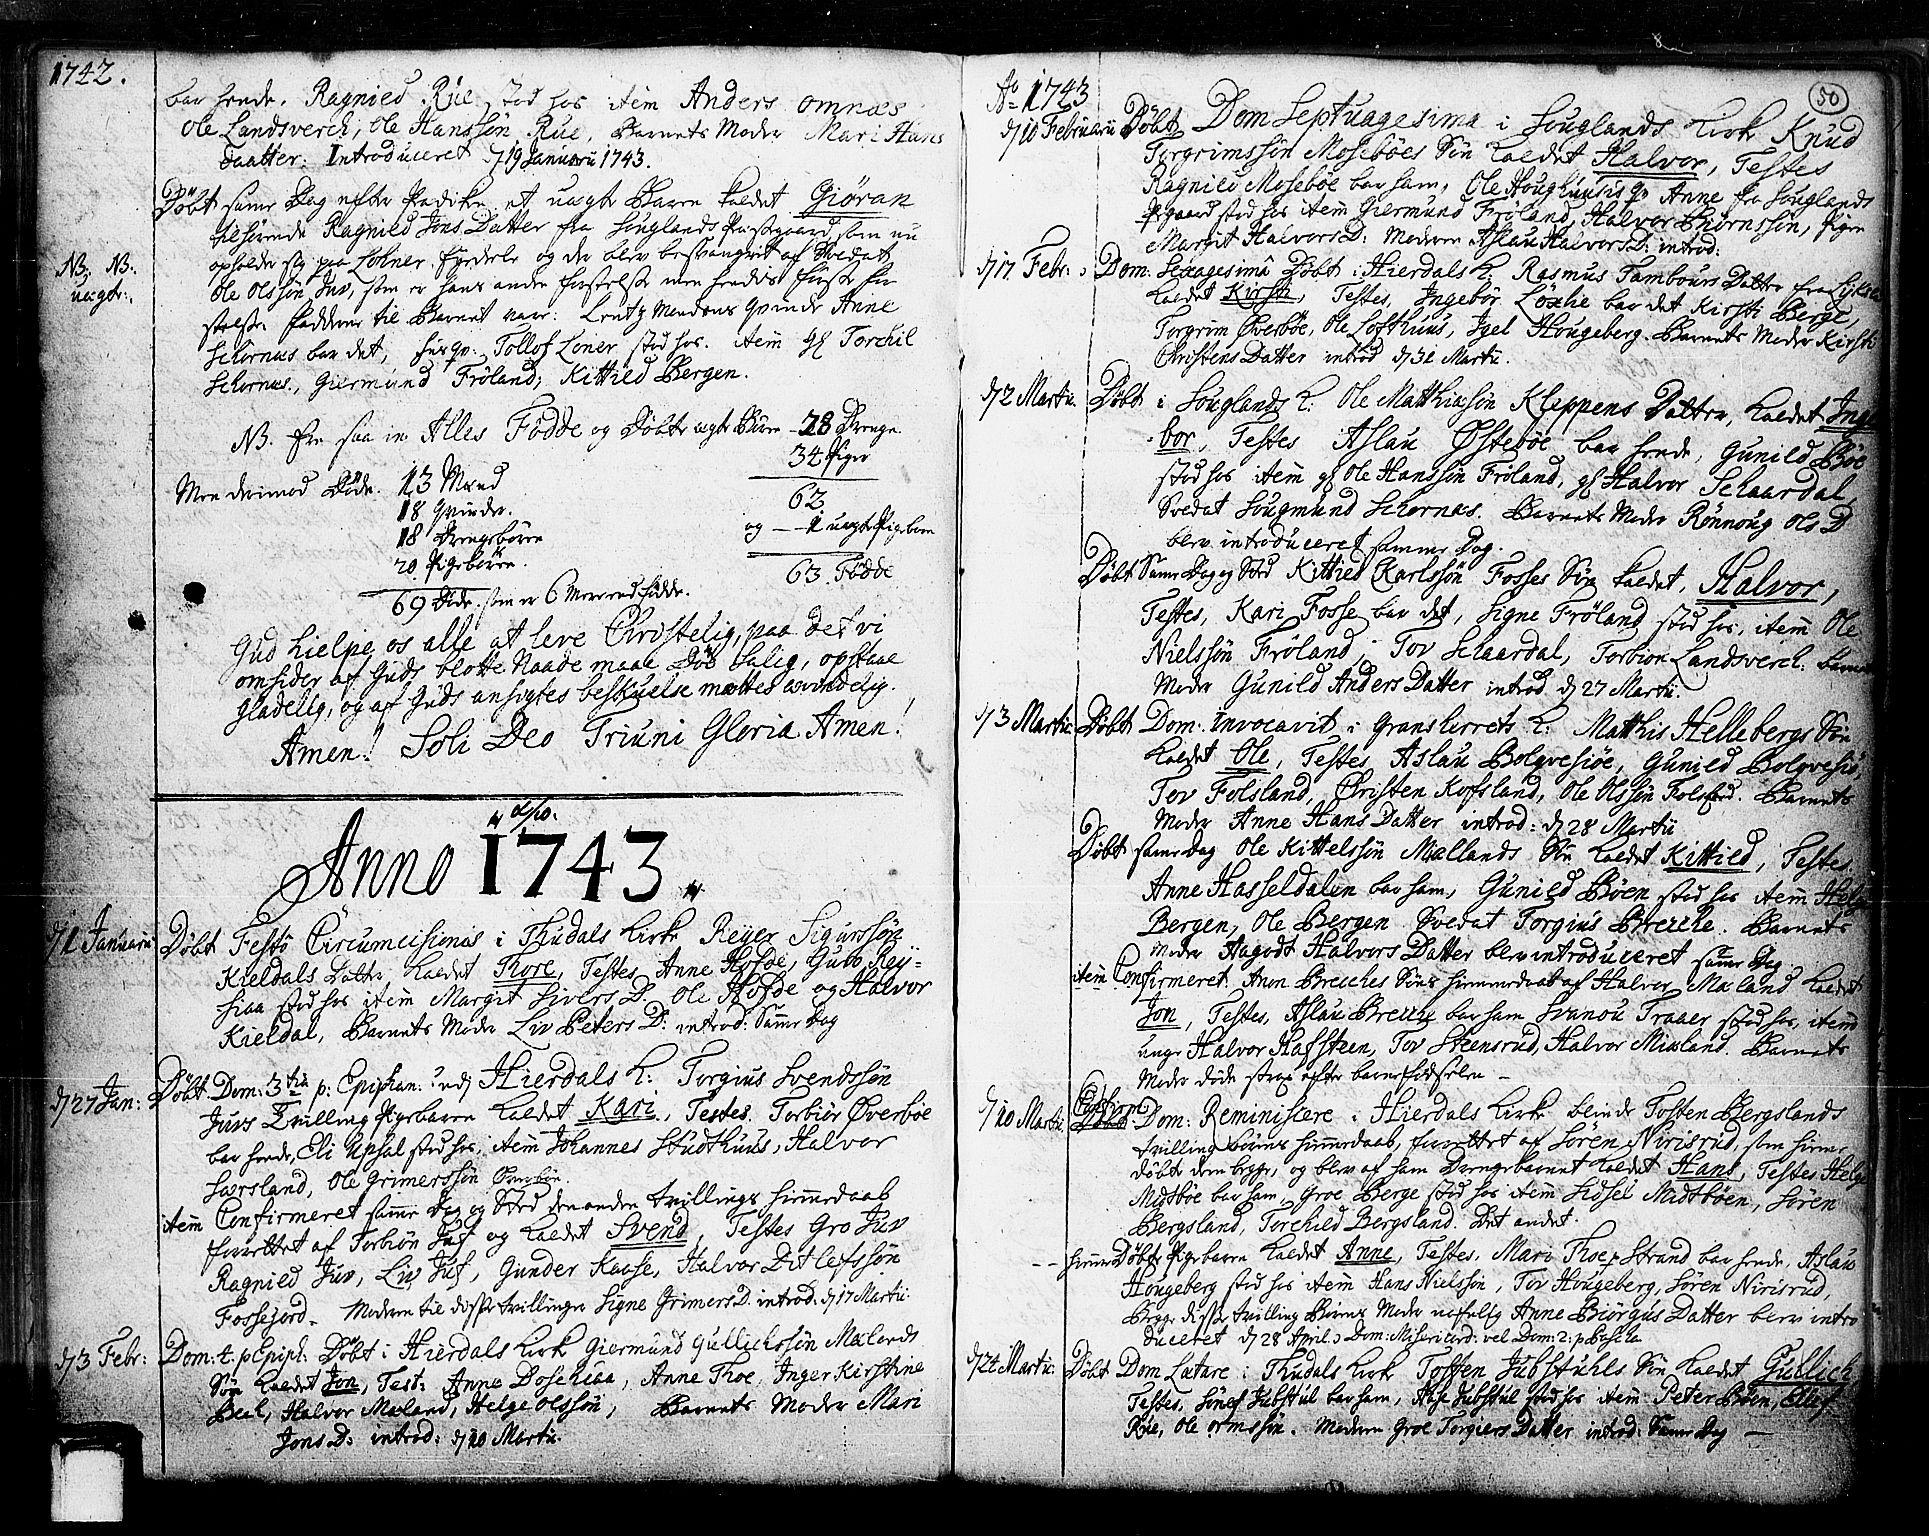 SAKO, Hjartdal kirkebøker, F/Fa/L0003: Ministerialbok nr. I 3, 1727-1775, s. 50